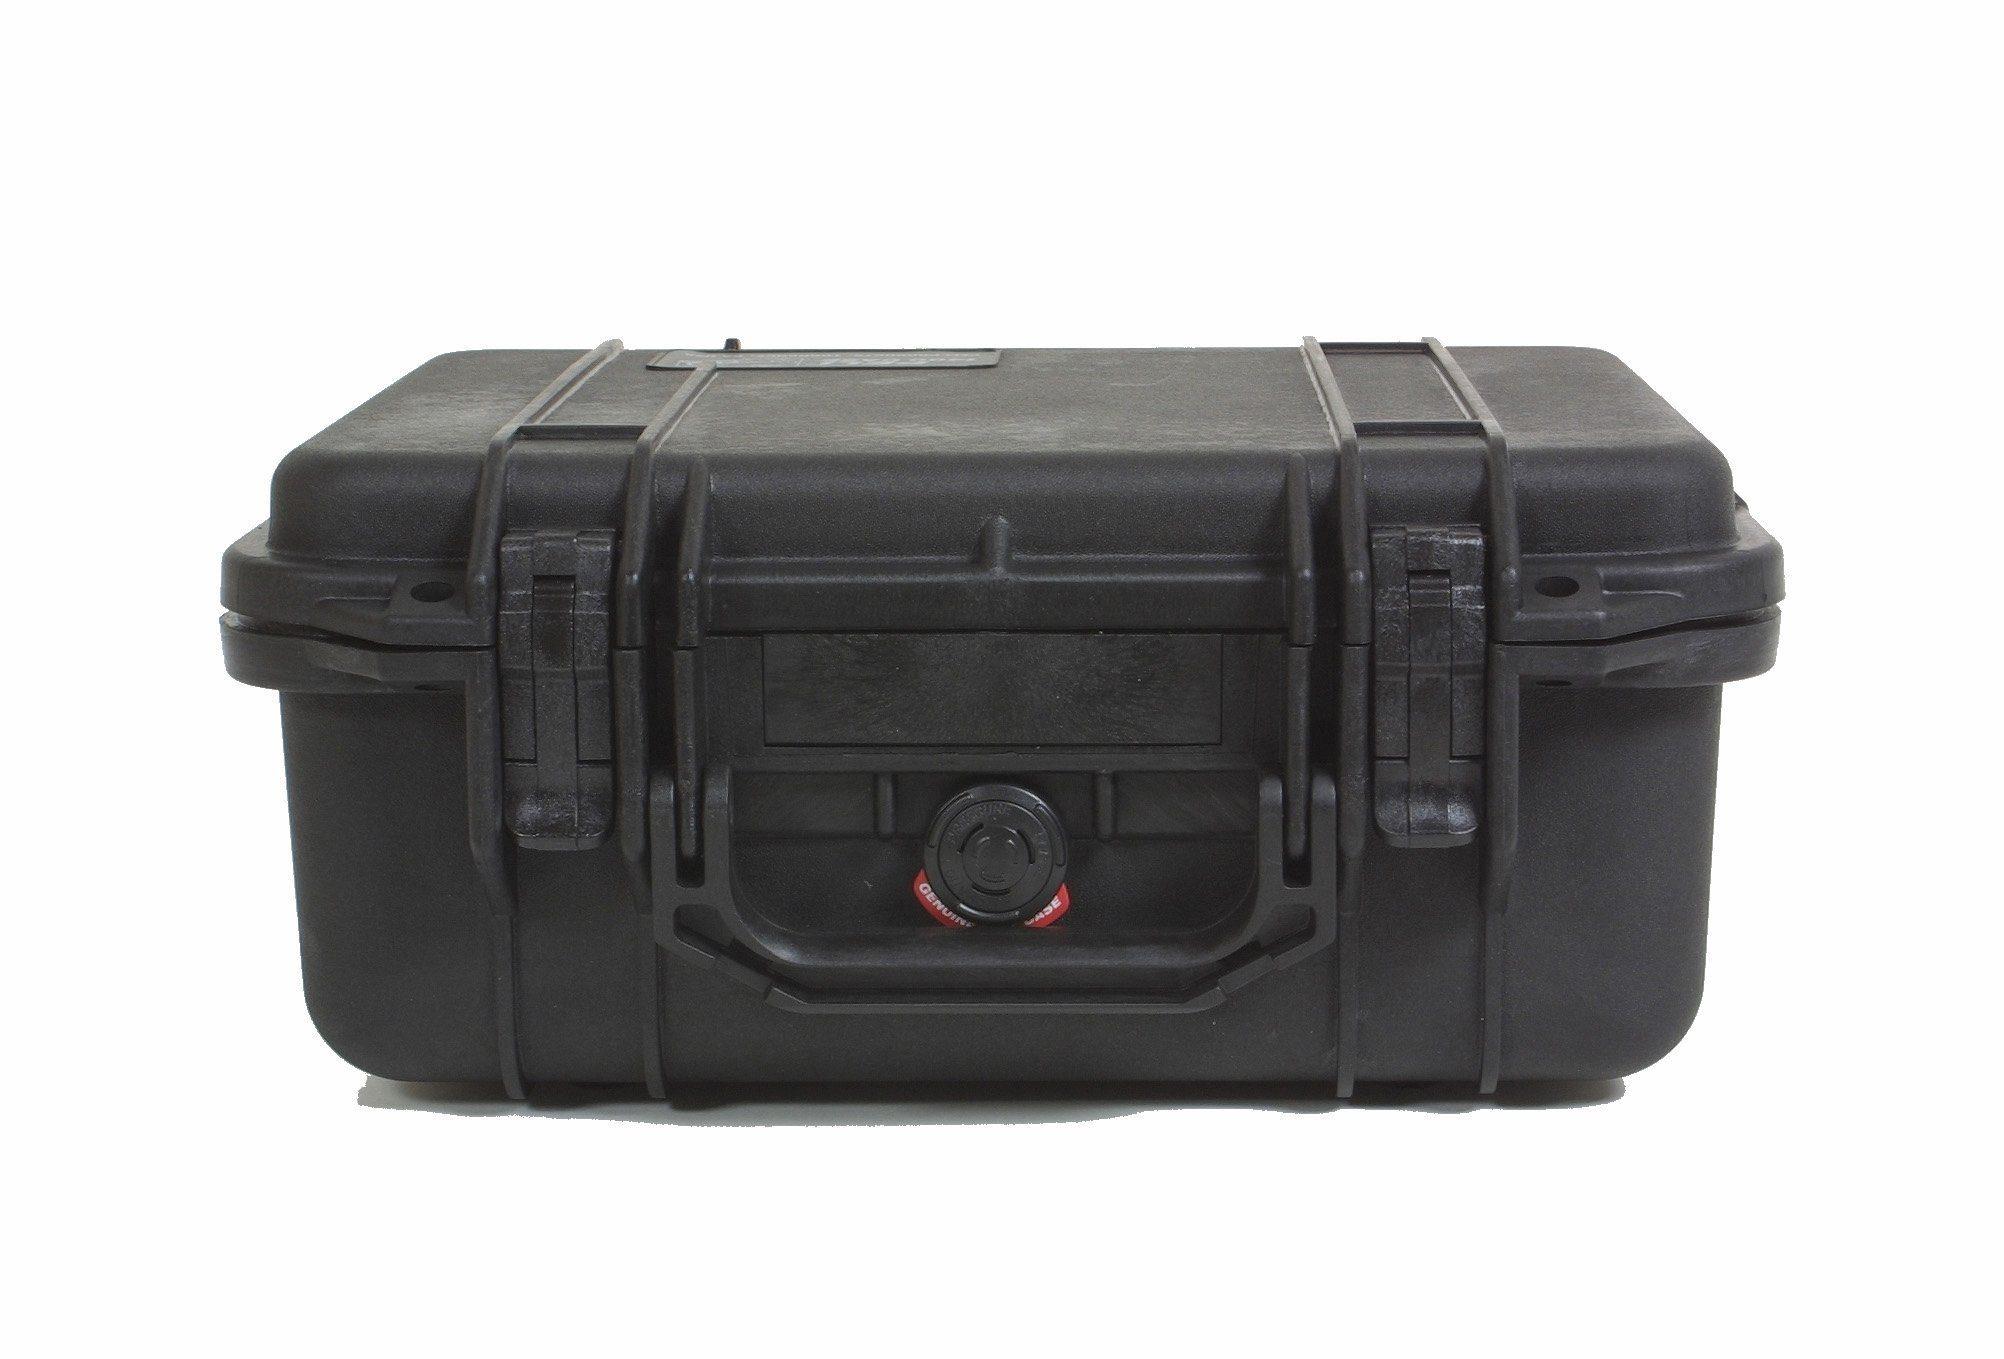 Peli Campingtruhe & -Kiste »1400 ohne Schaumeinsatz«